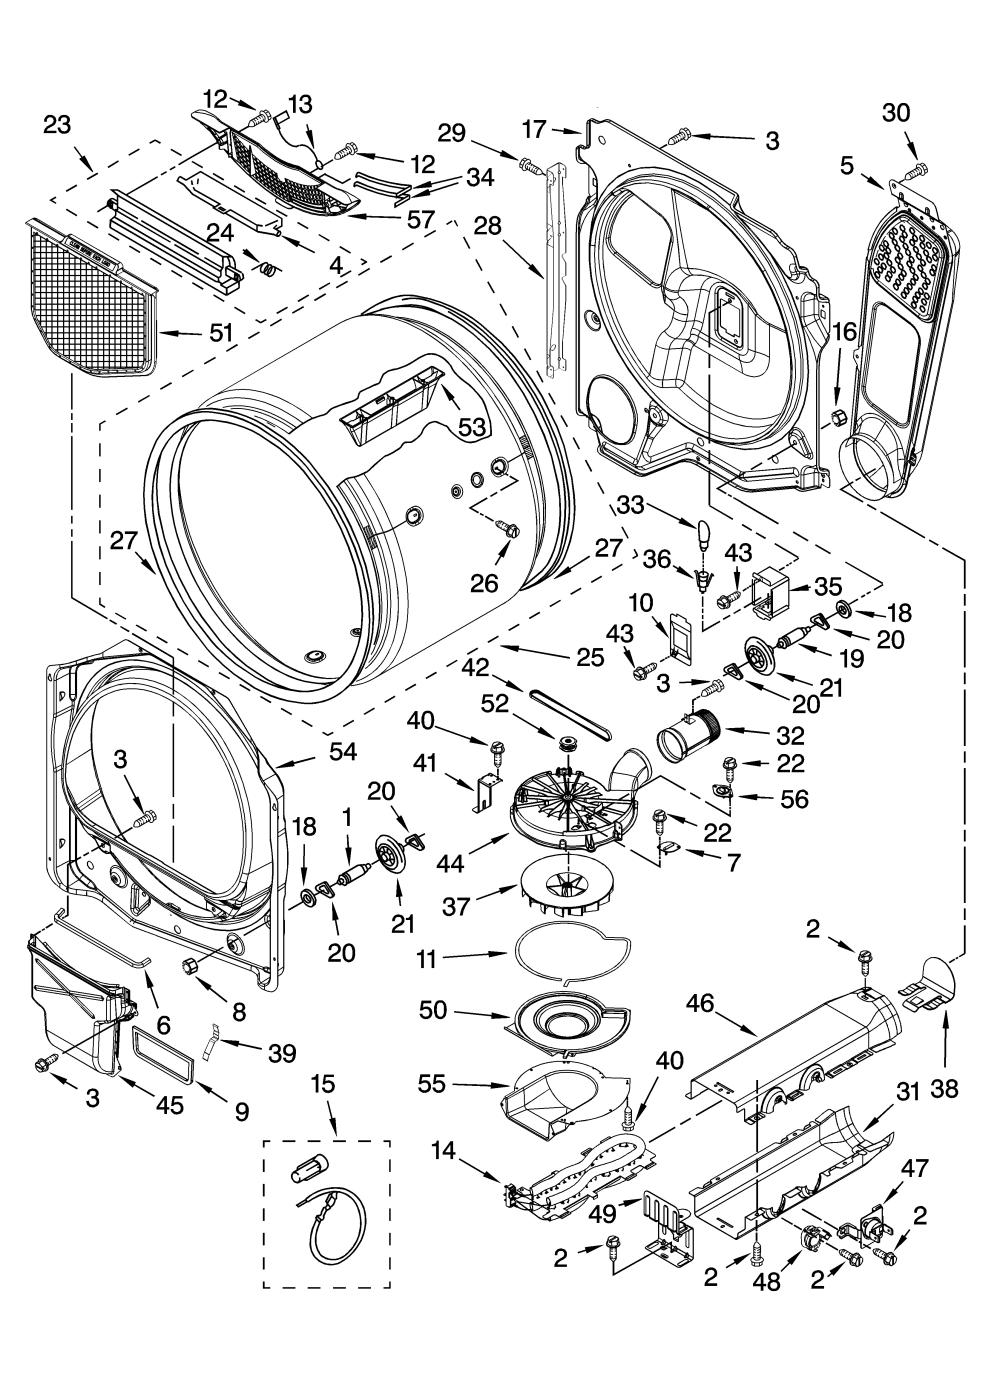 medium resolution of maytag neptune dryer wiring diagram in addition whirlpool dryer belt